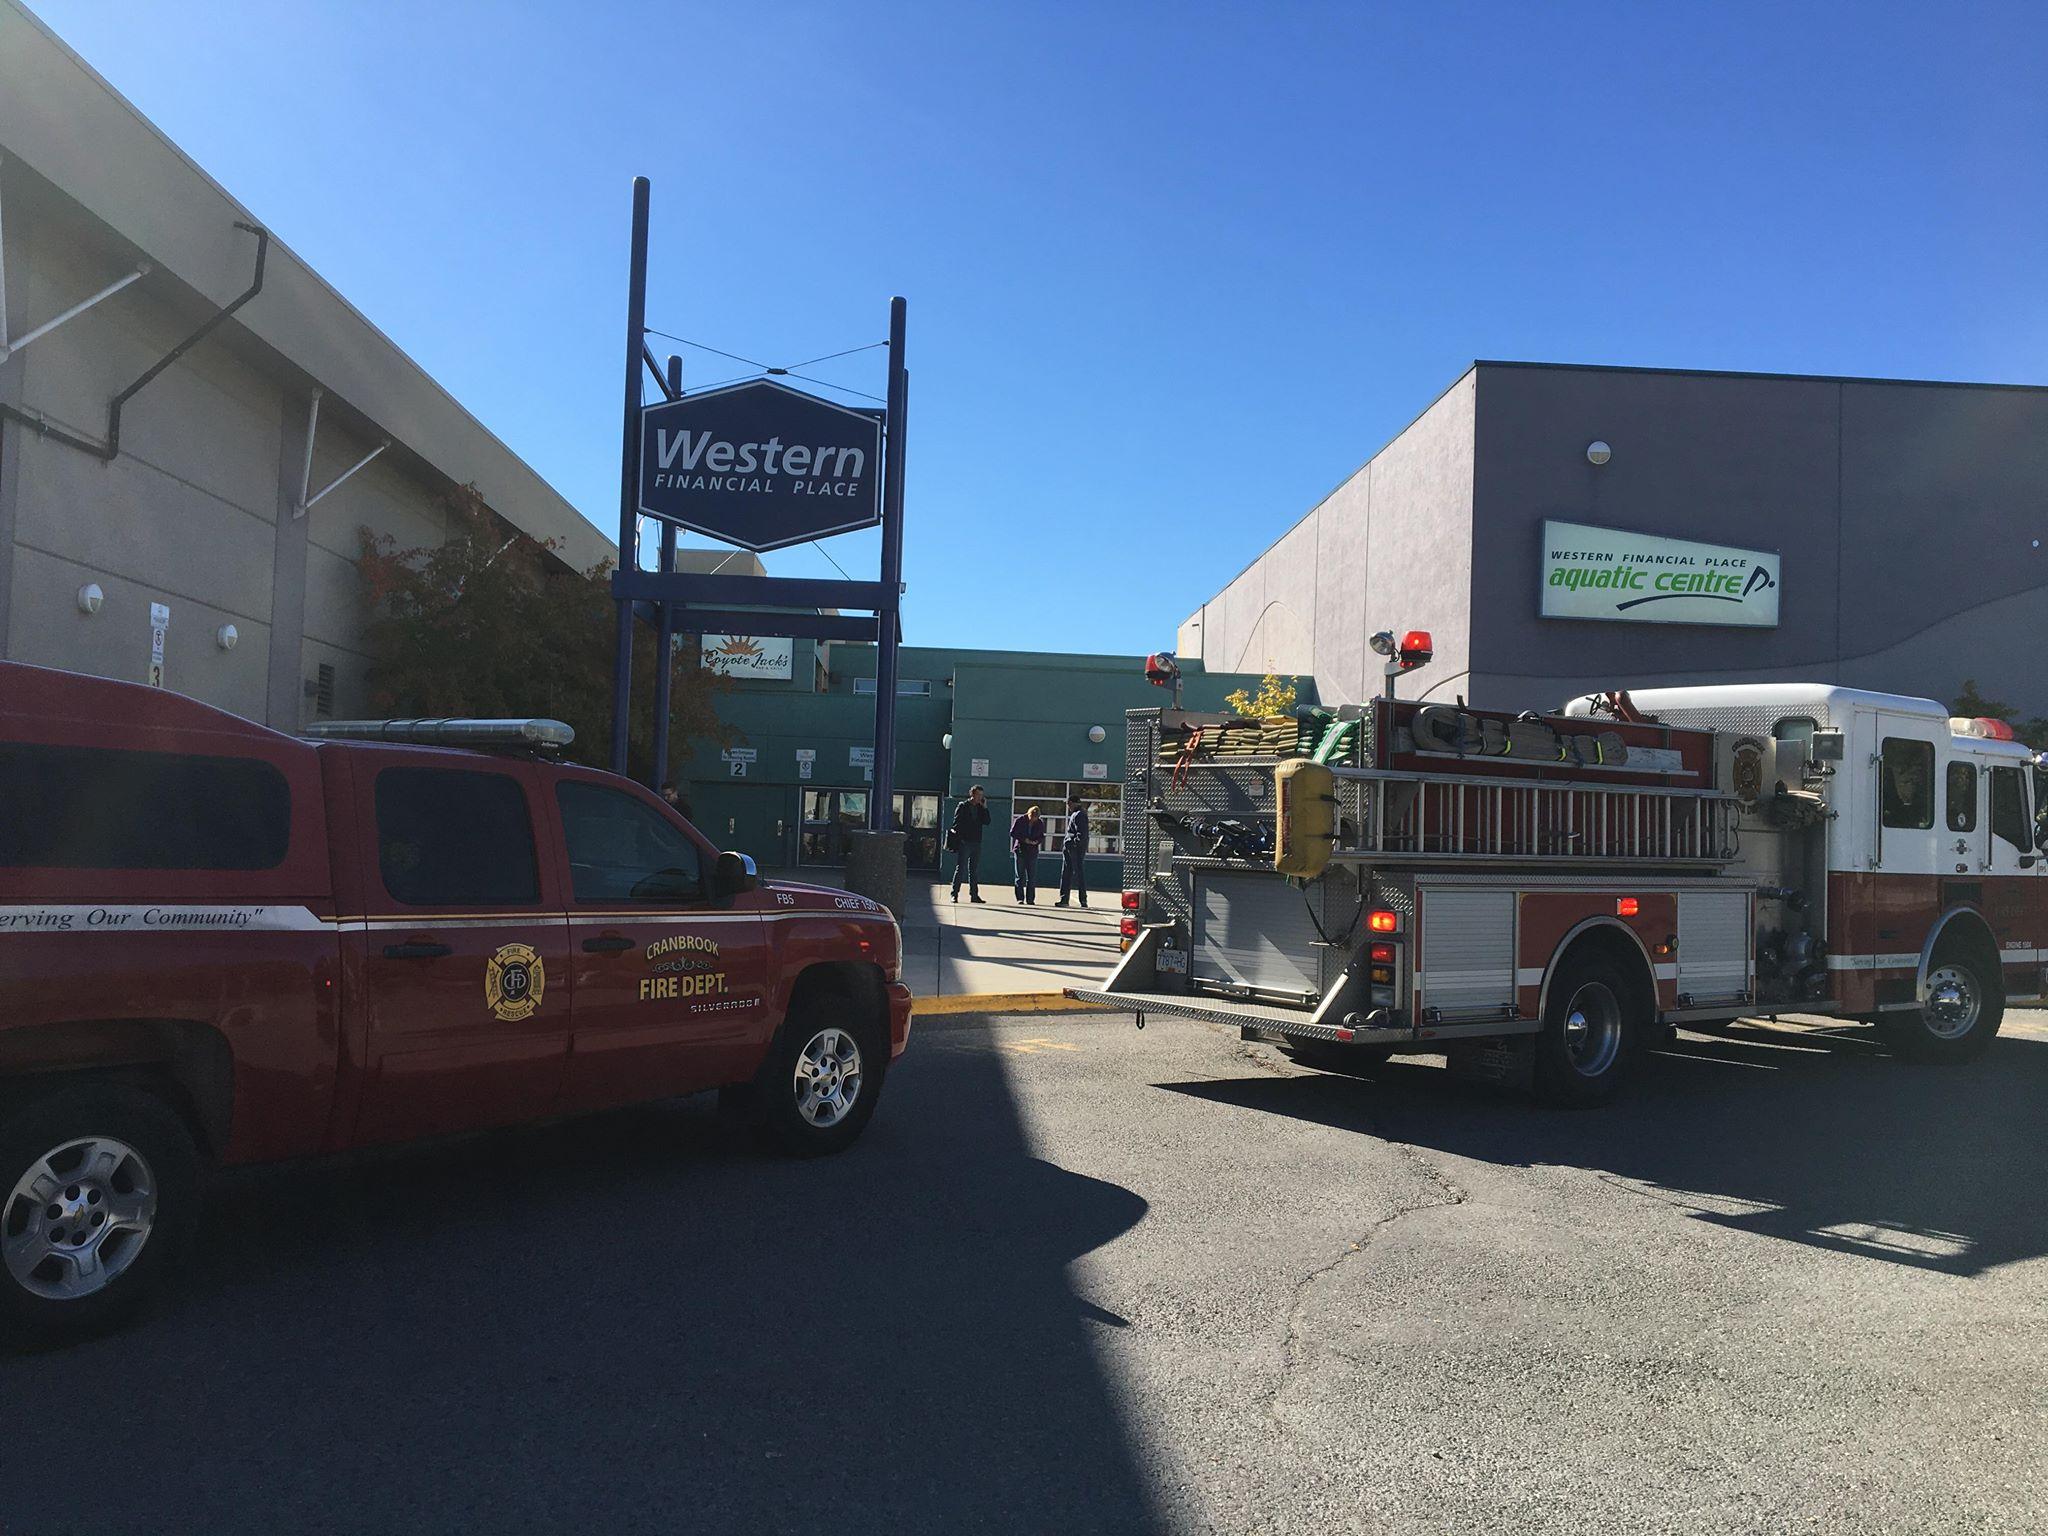 All patrons allowed inside Cranbrook's Western Financial Place following gas leak